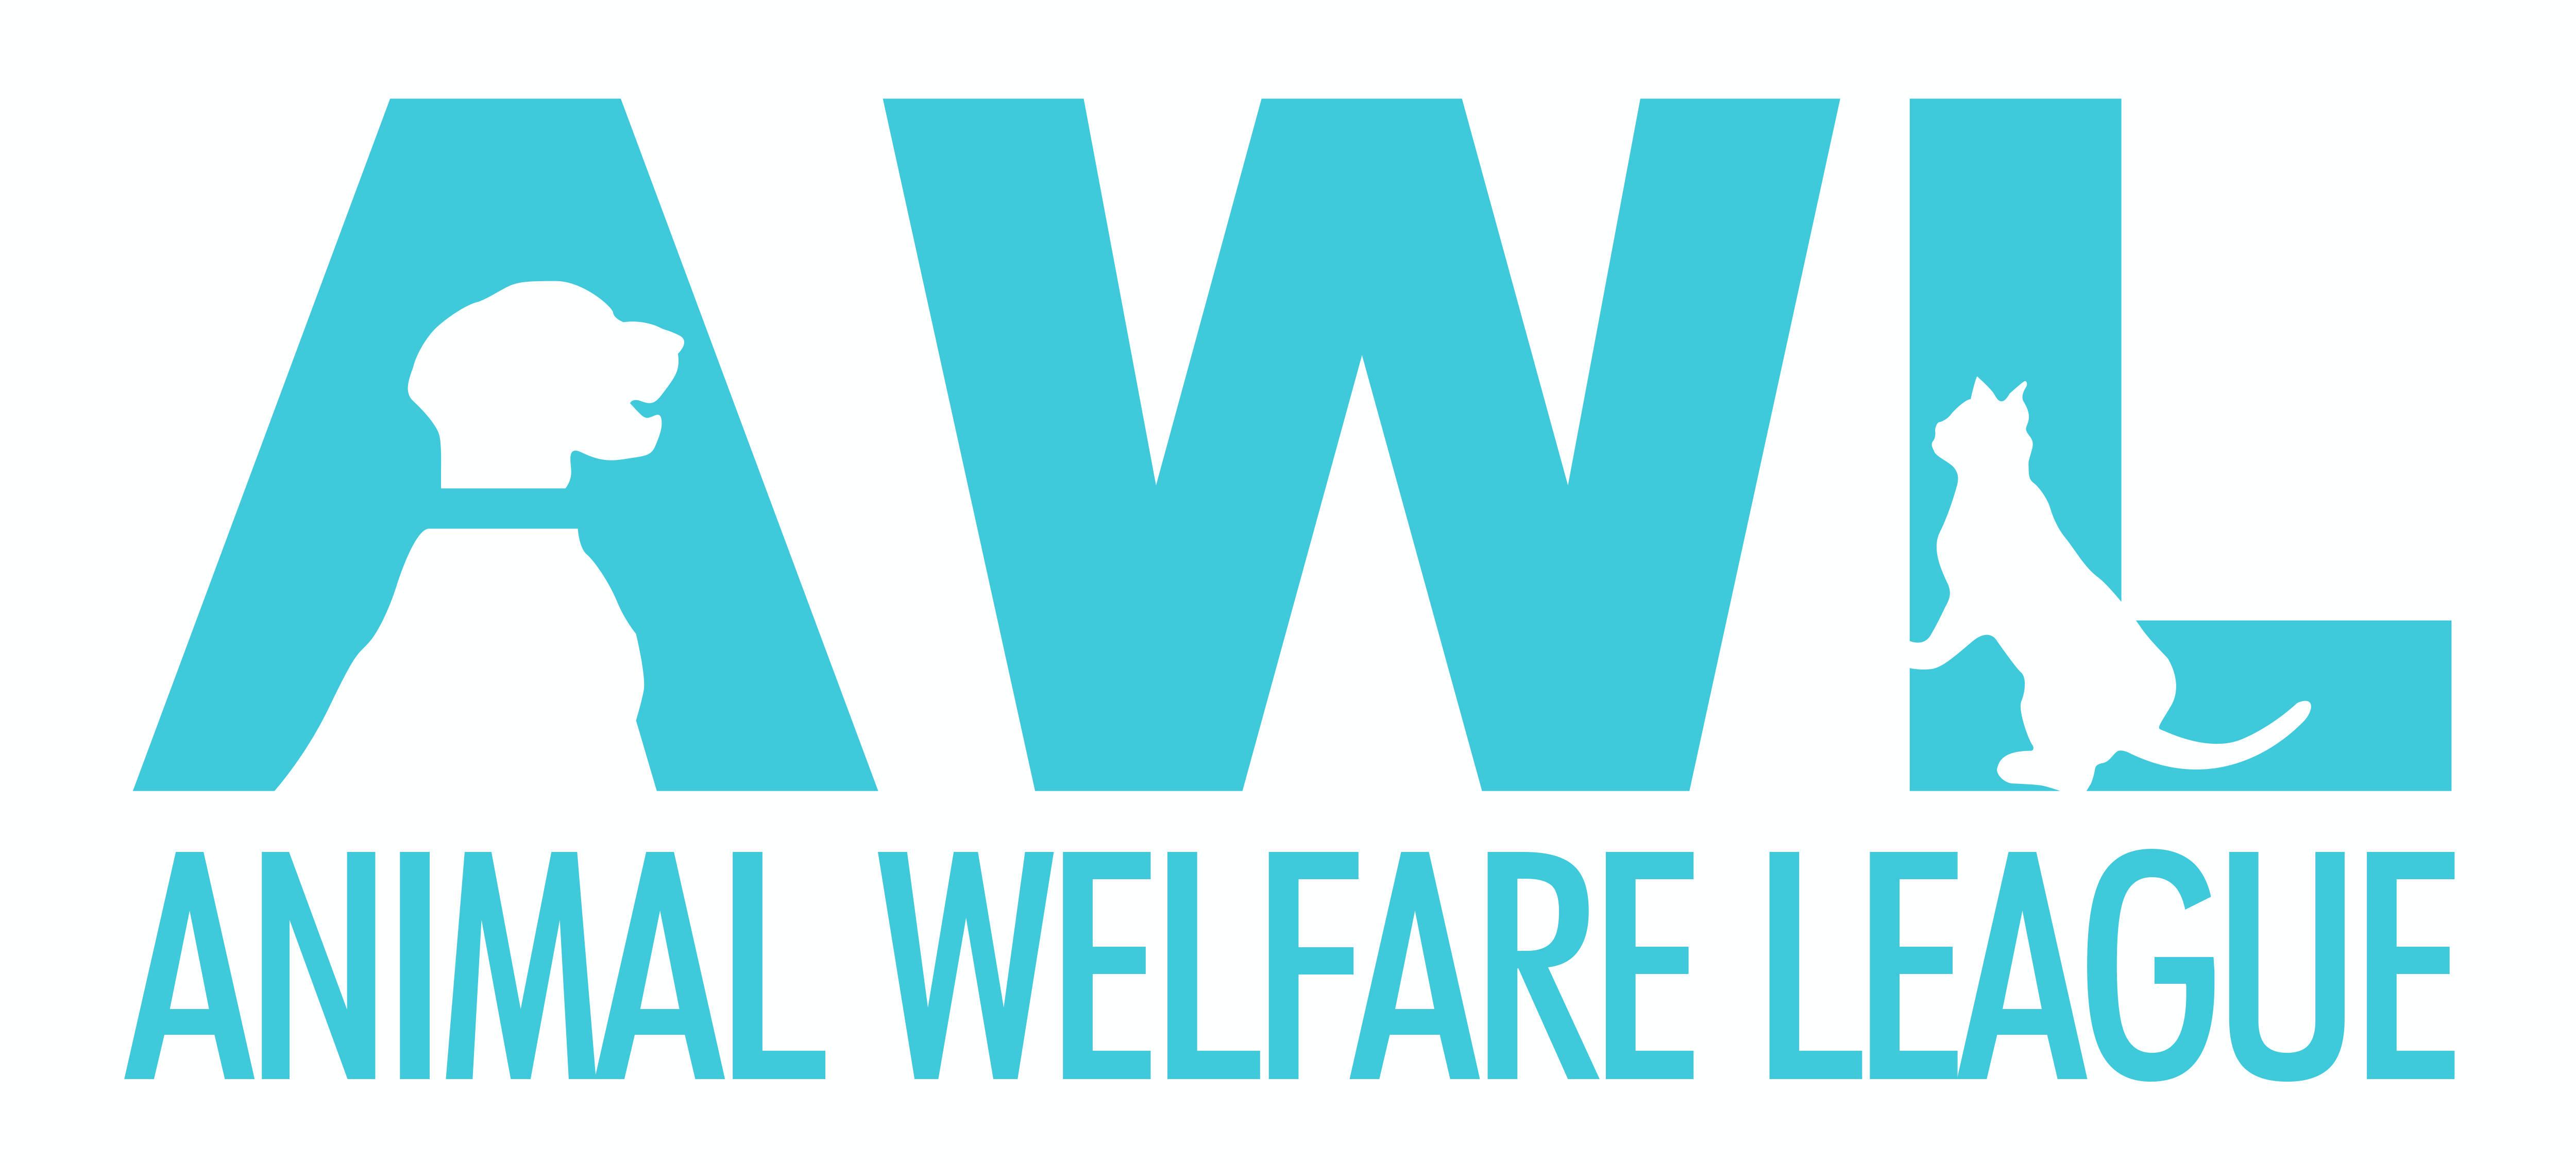 Animal Welfare League of Trumbull County